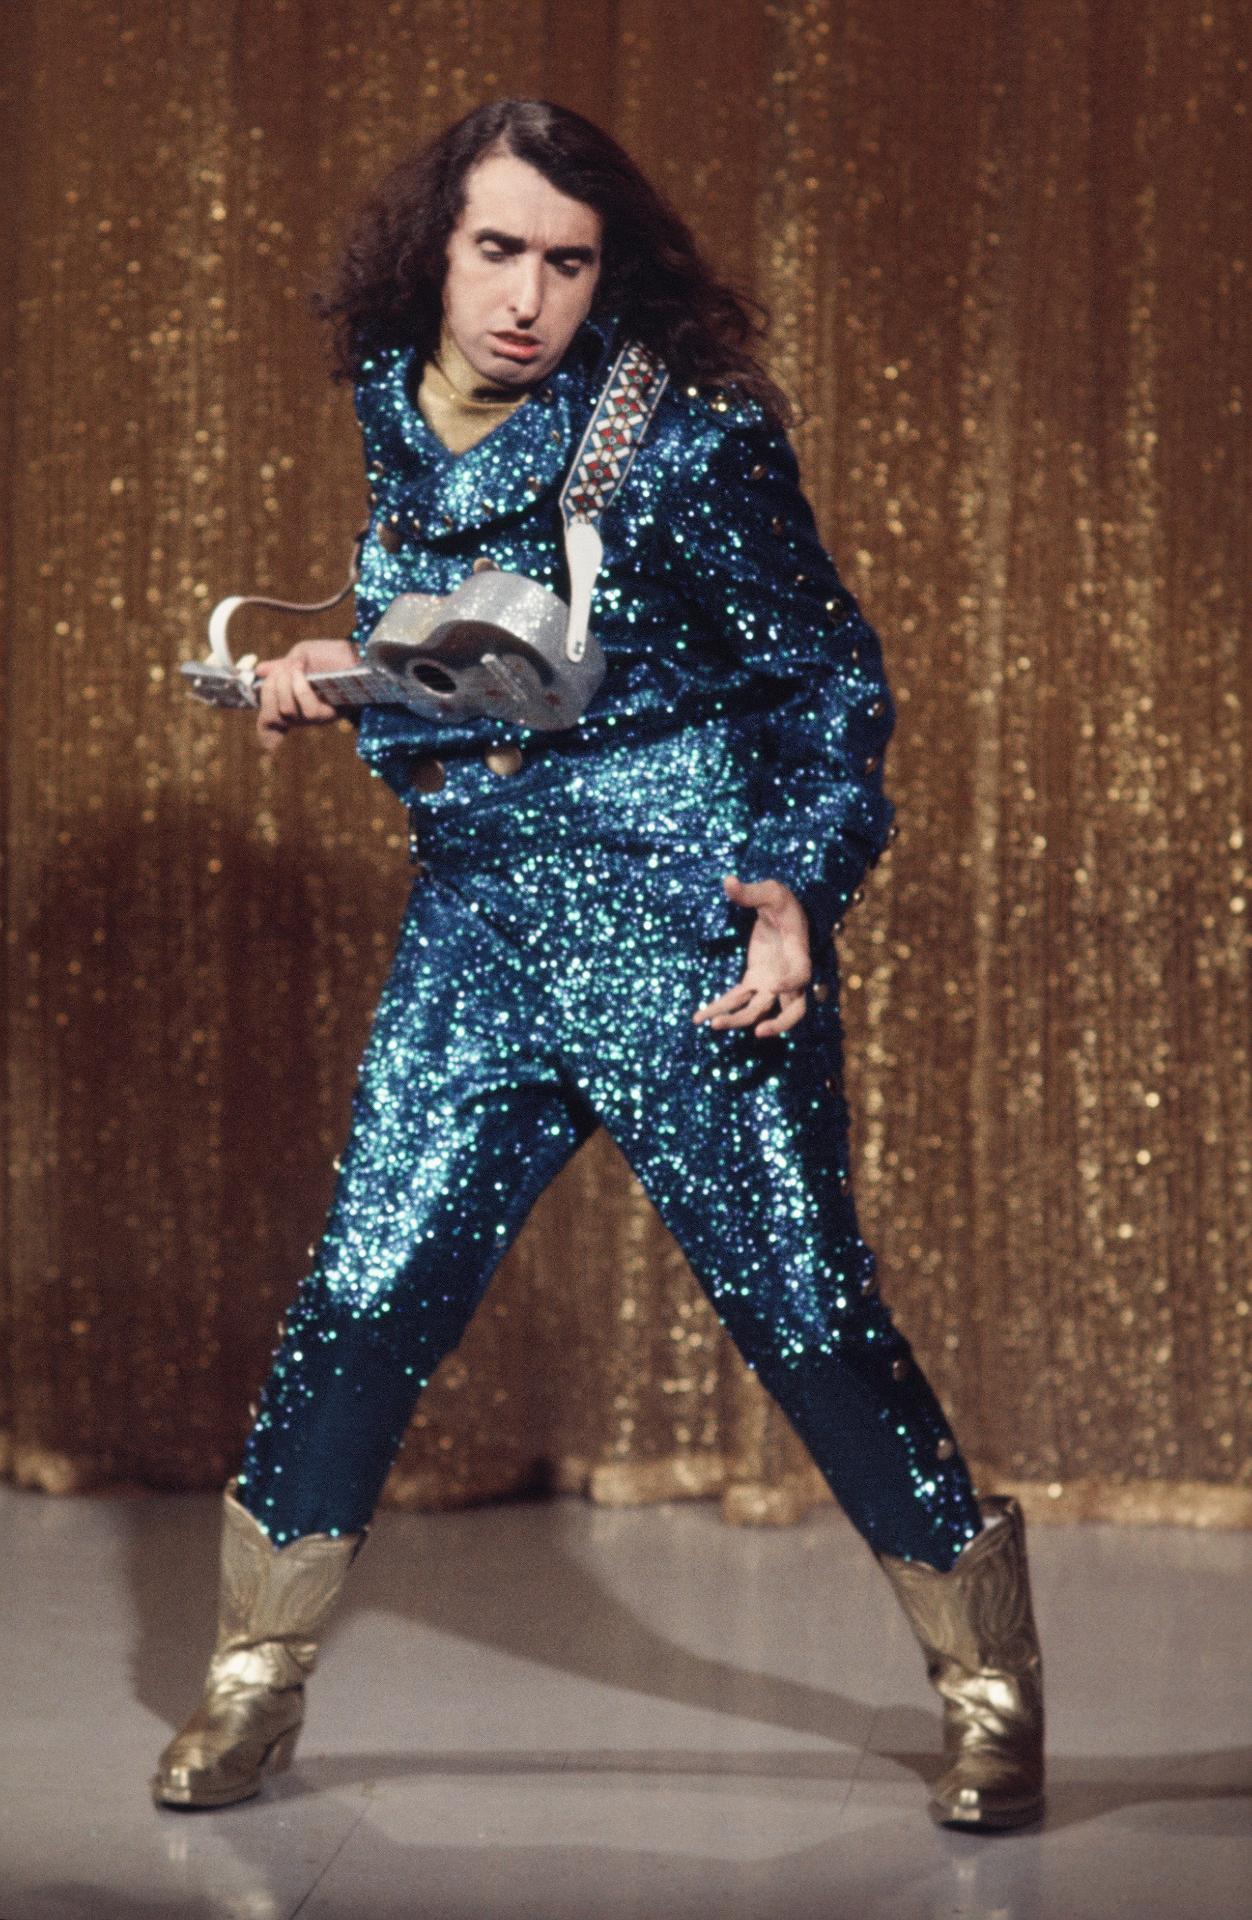 1968. Tiny Tim